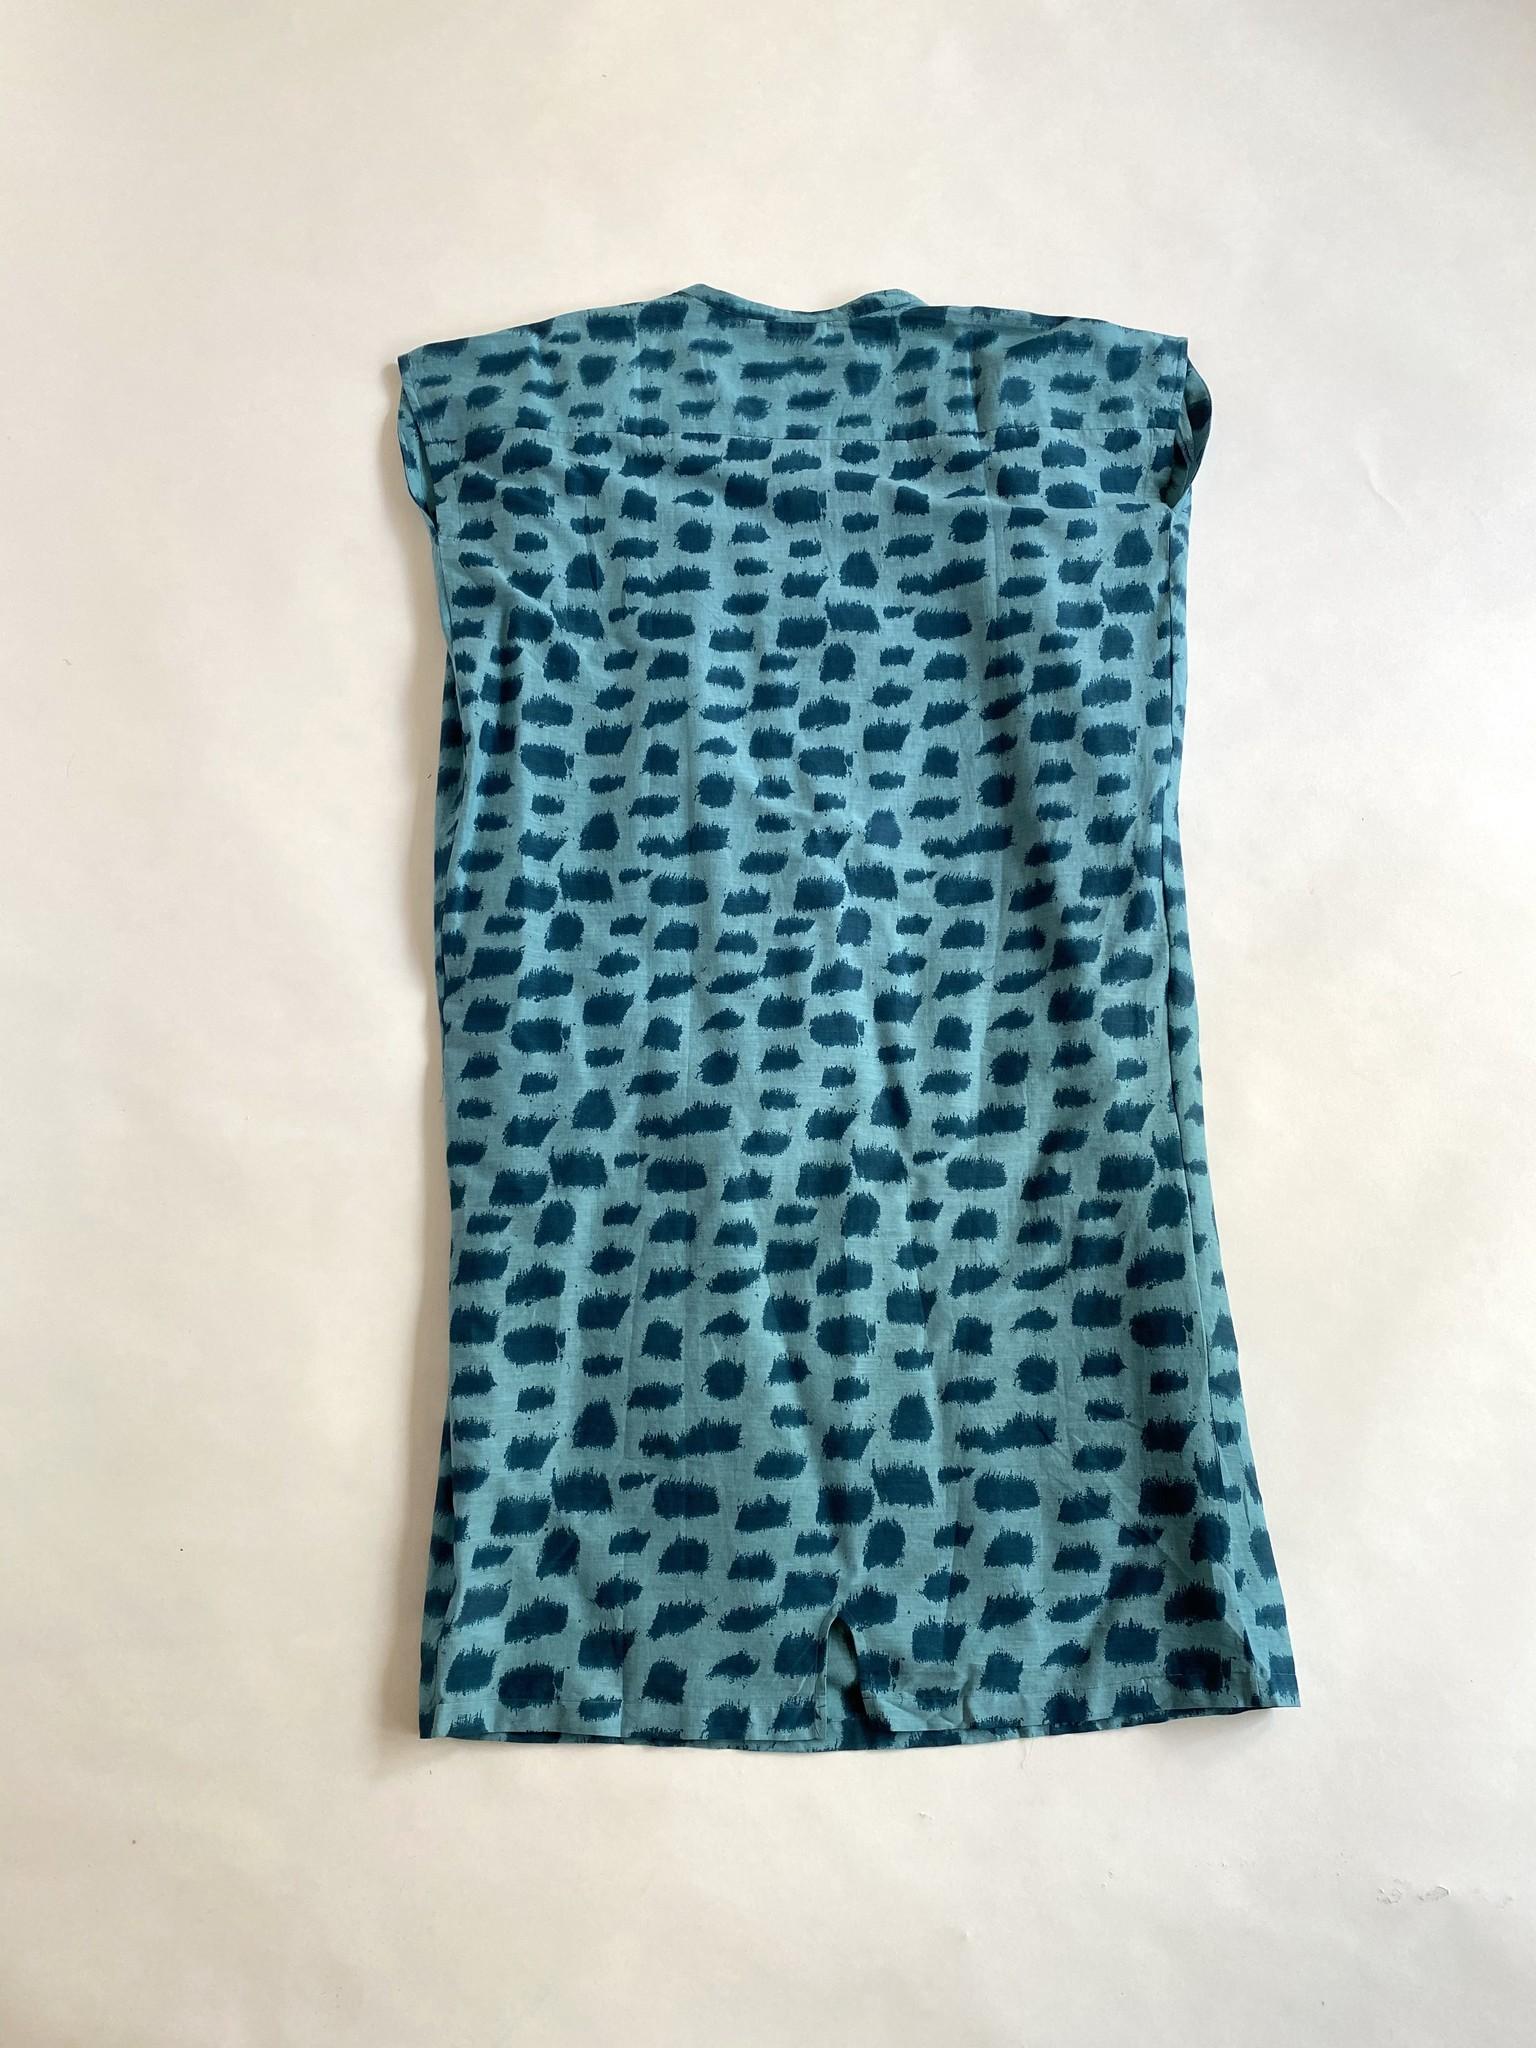 Diega Diega Rega Teal Cotton Dress